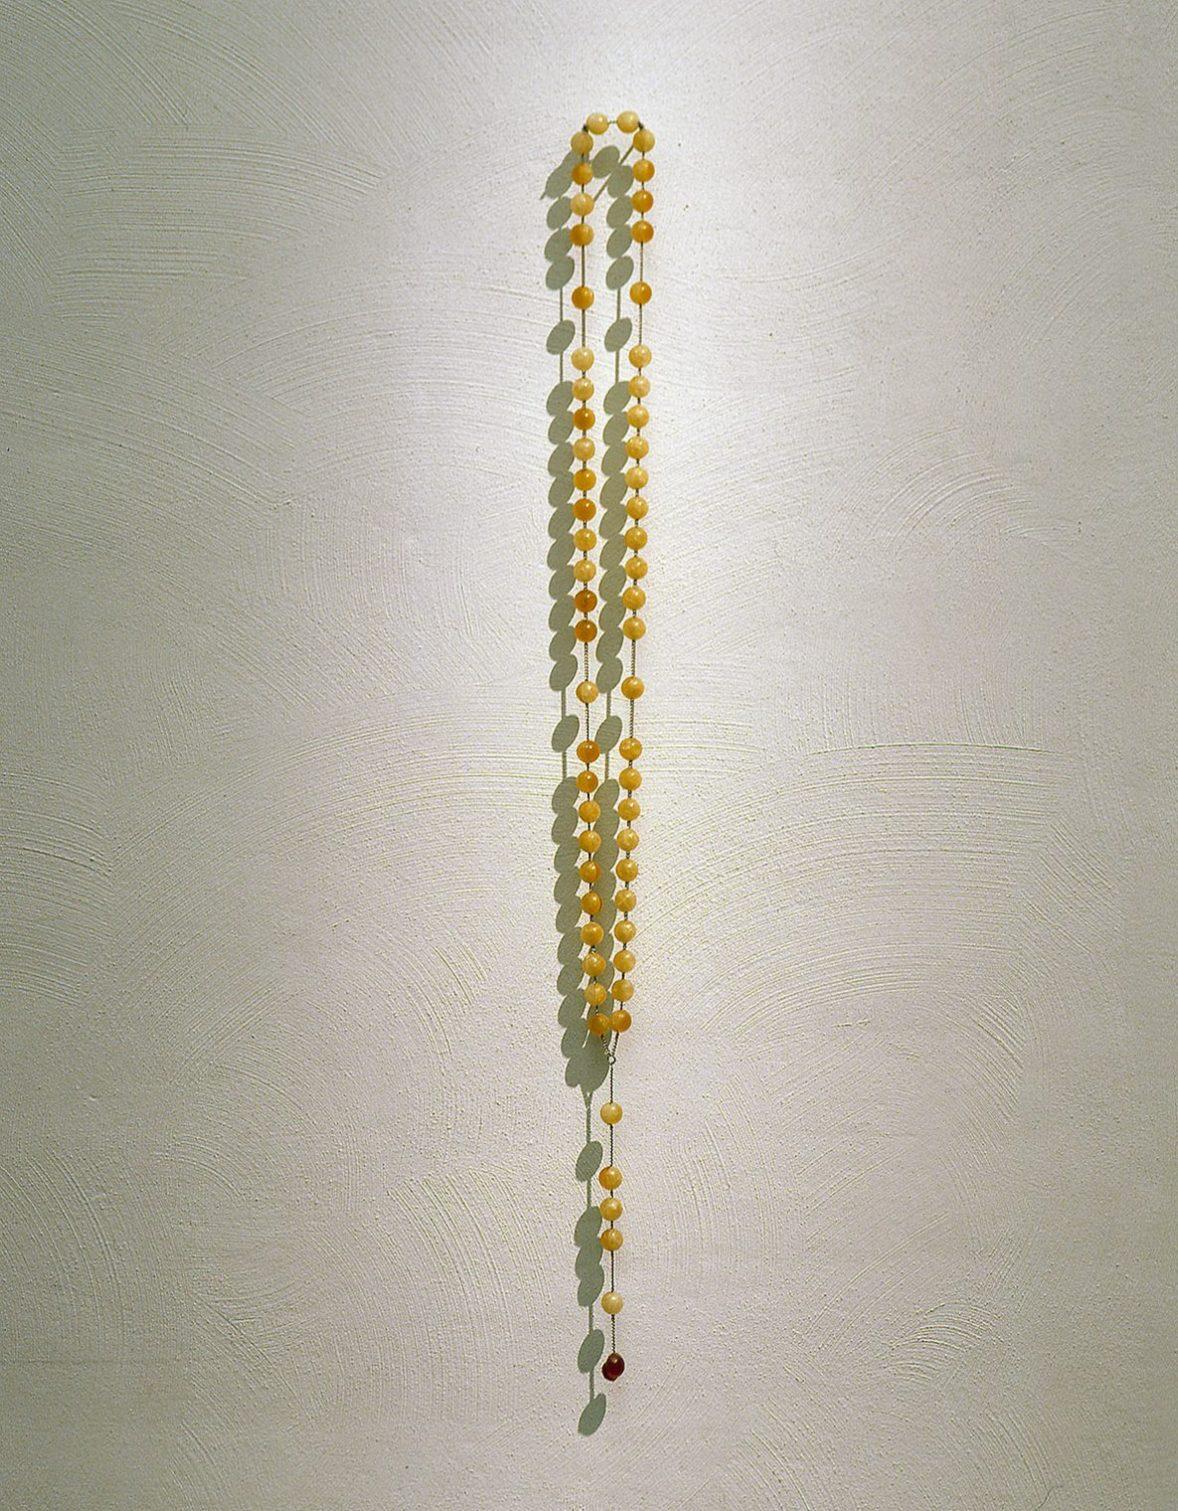 Rosary, 1999, sugar, wine, chain, 120 cm